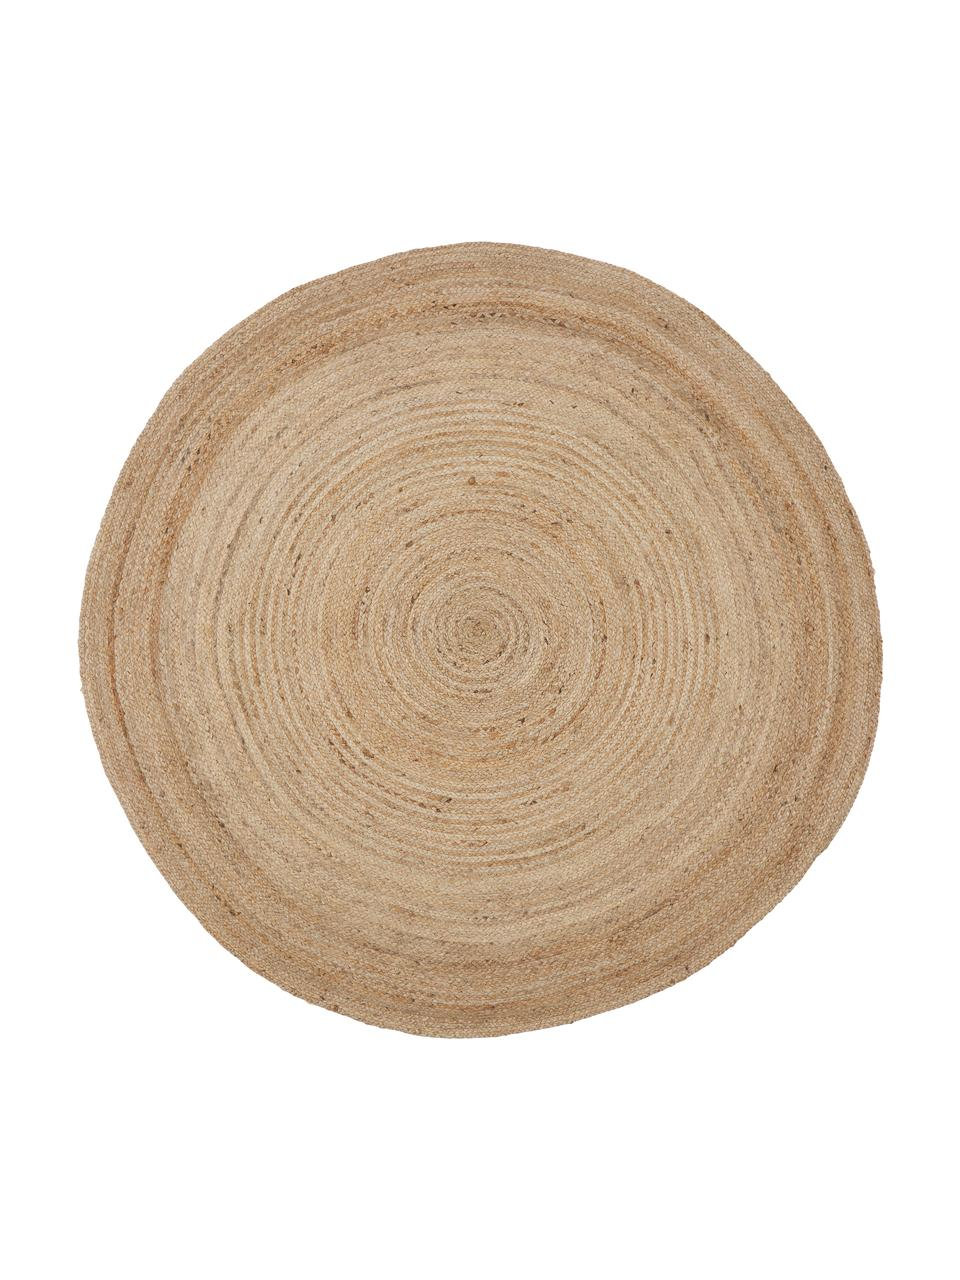 Alfombra redonda de yute Ural, 100%yute, Beige, Ø 150 cm (Tamaño M)